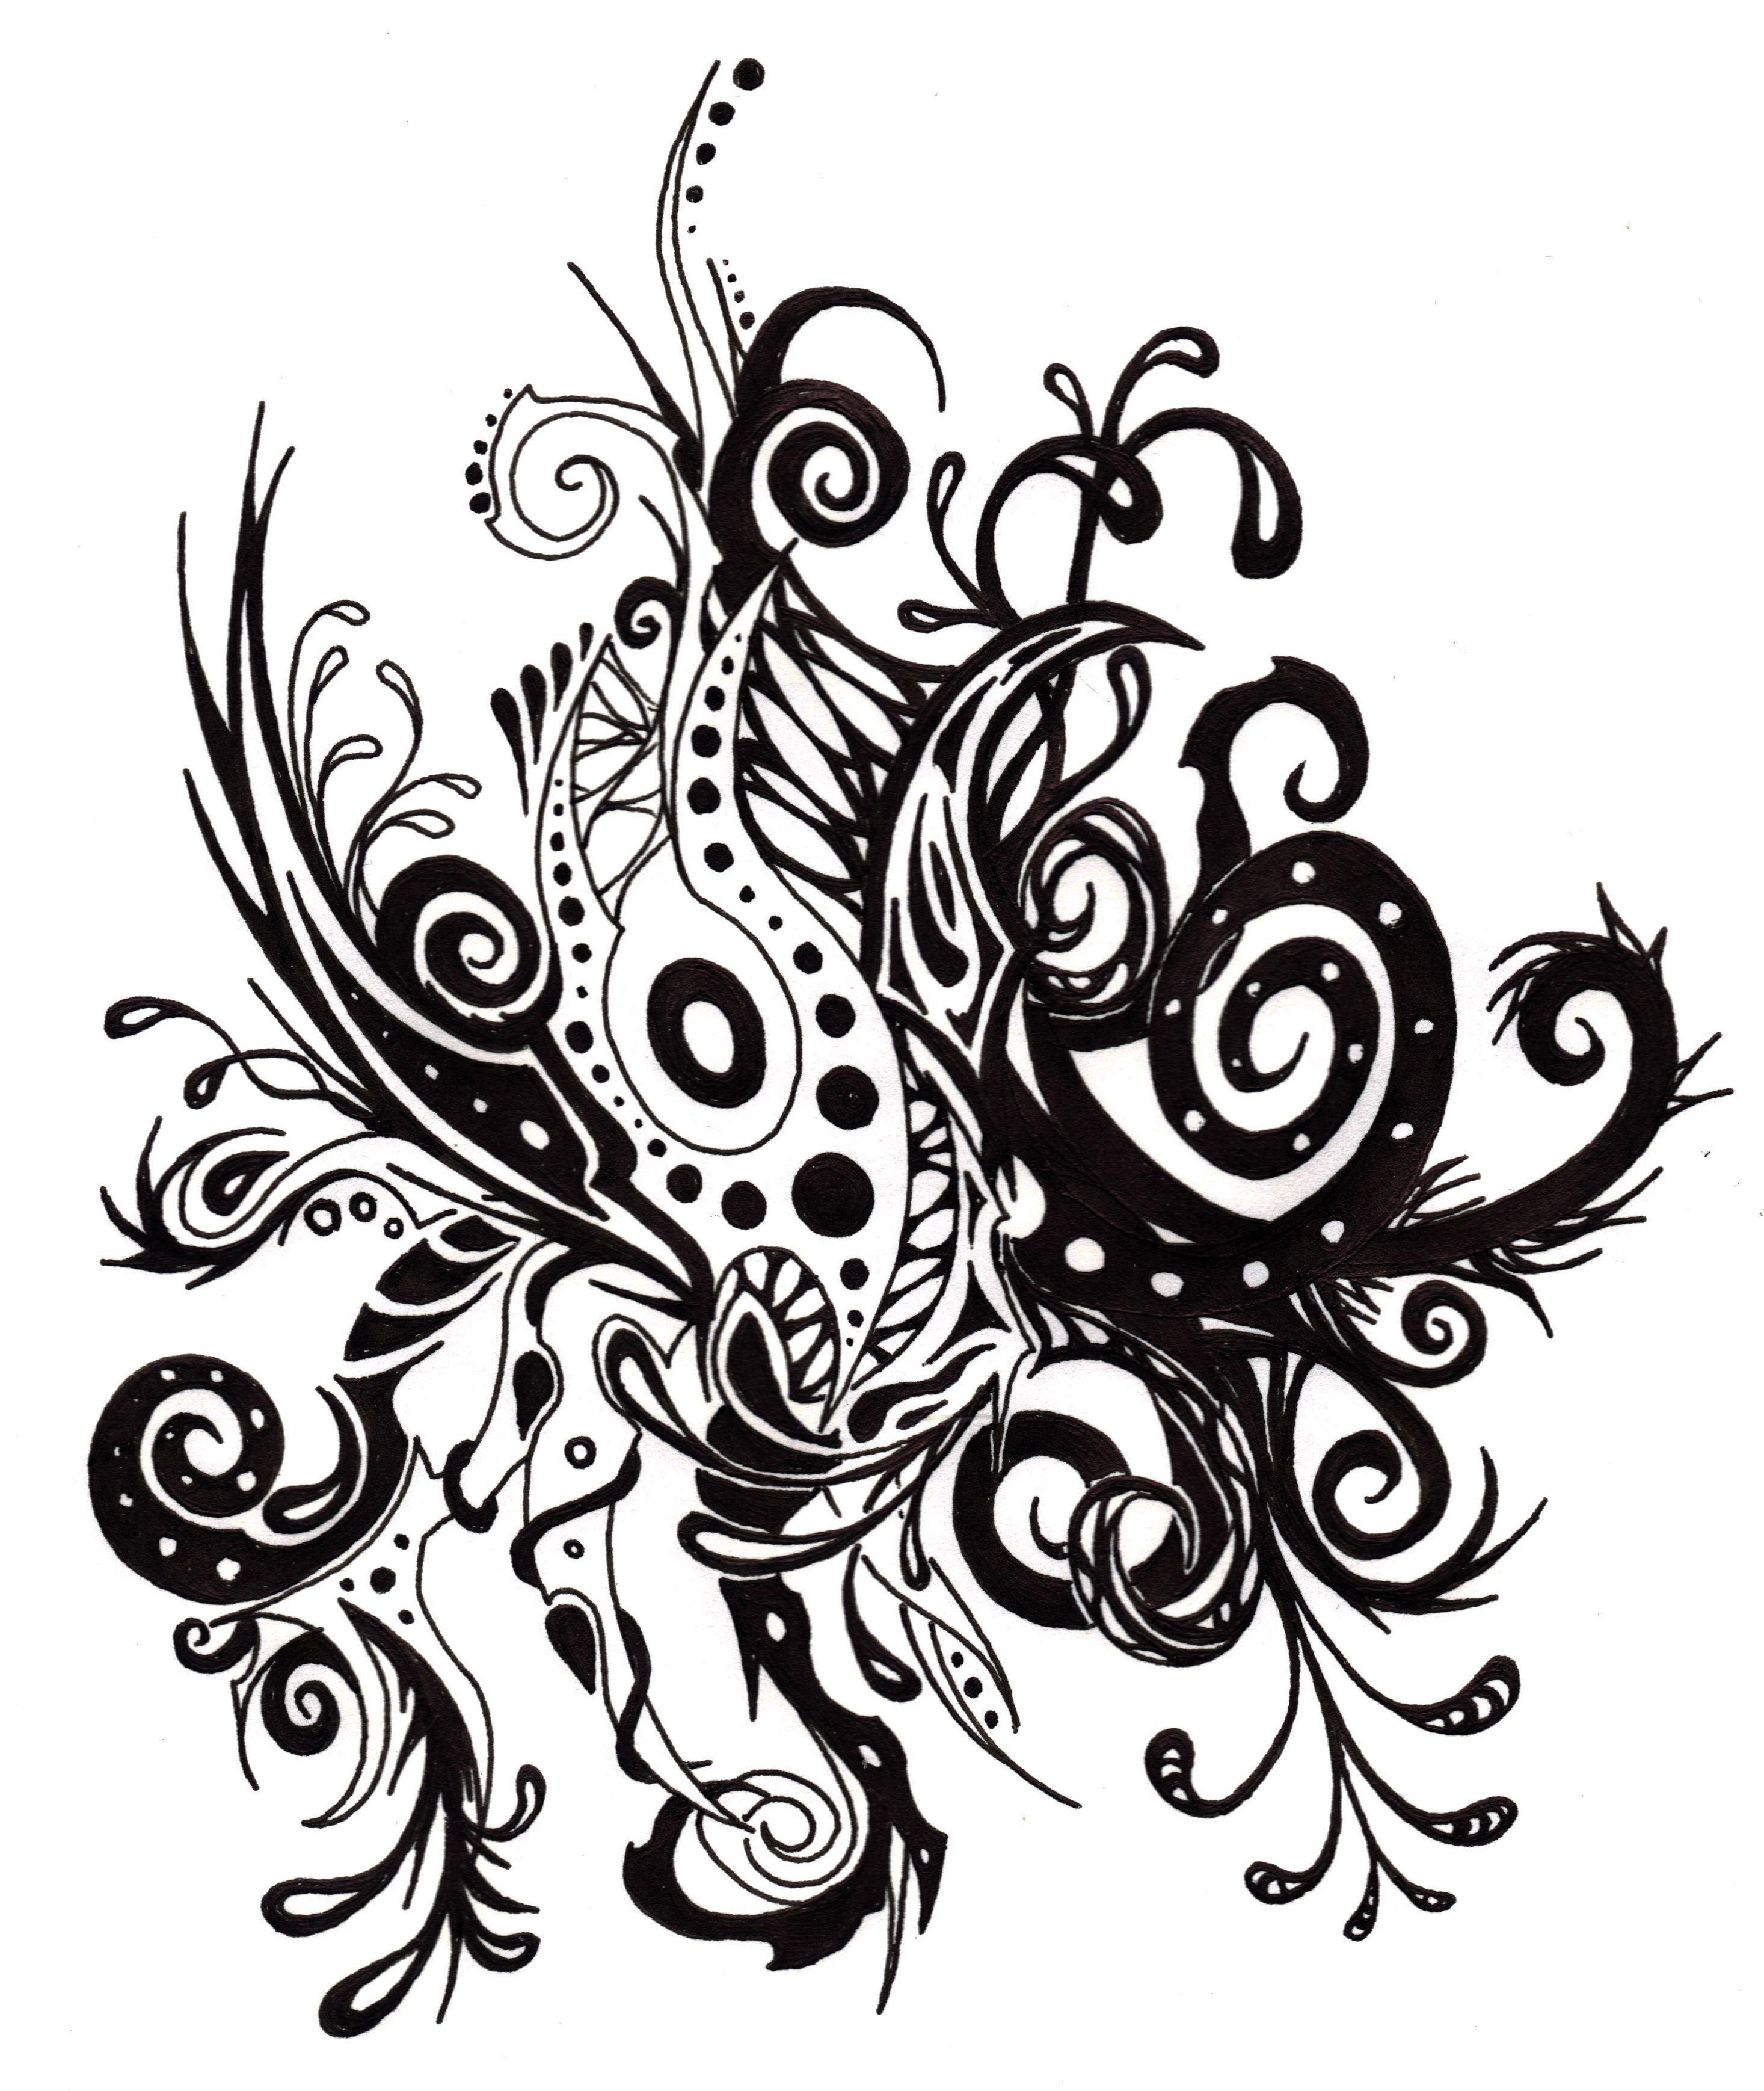 Plantes mal fiques t dessin pinterest dessin - Dessin de malefique ...